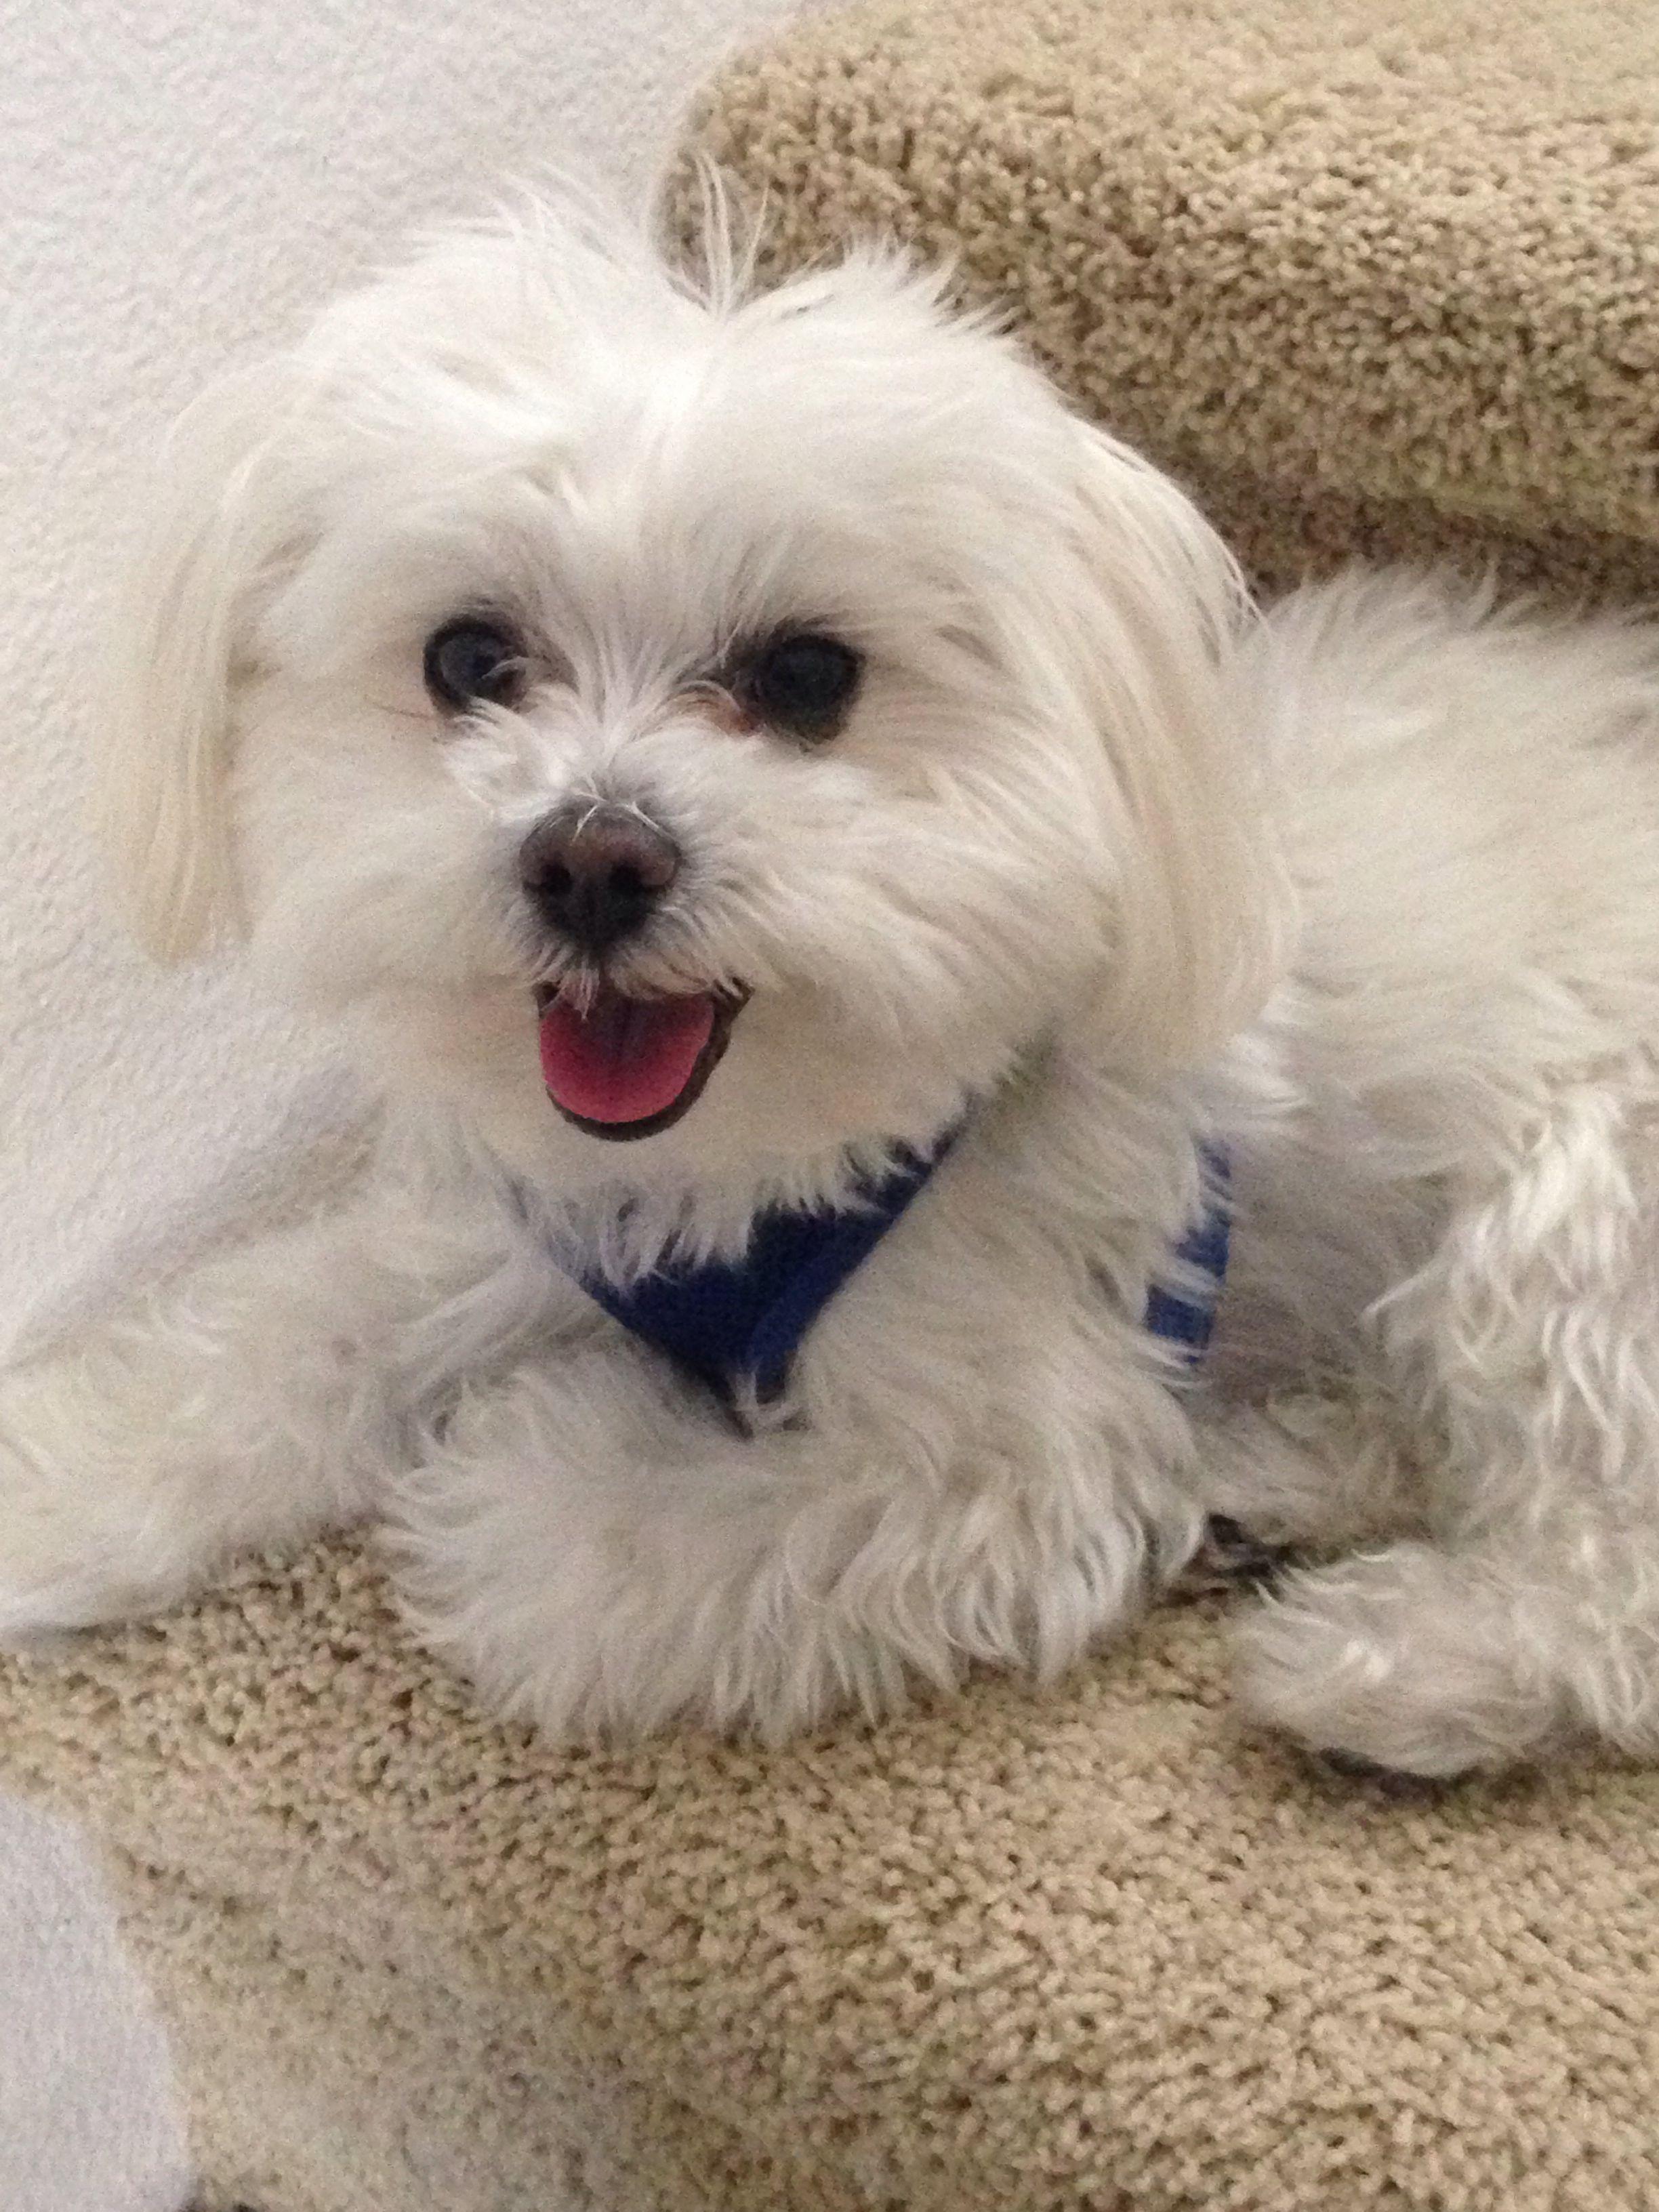 Looks Like My Dandi Boy 3 Maltese Puppy Maltese Dogs Puppies